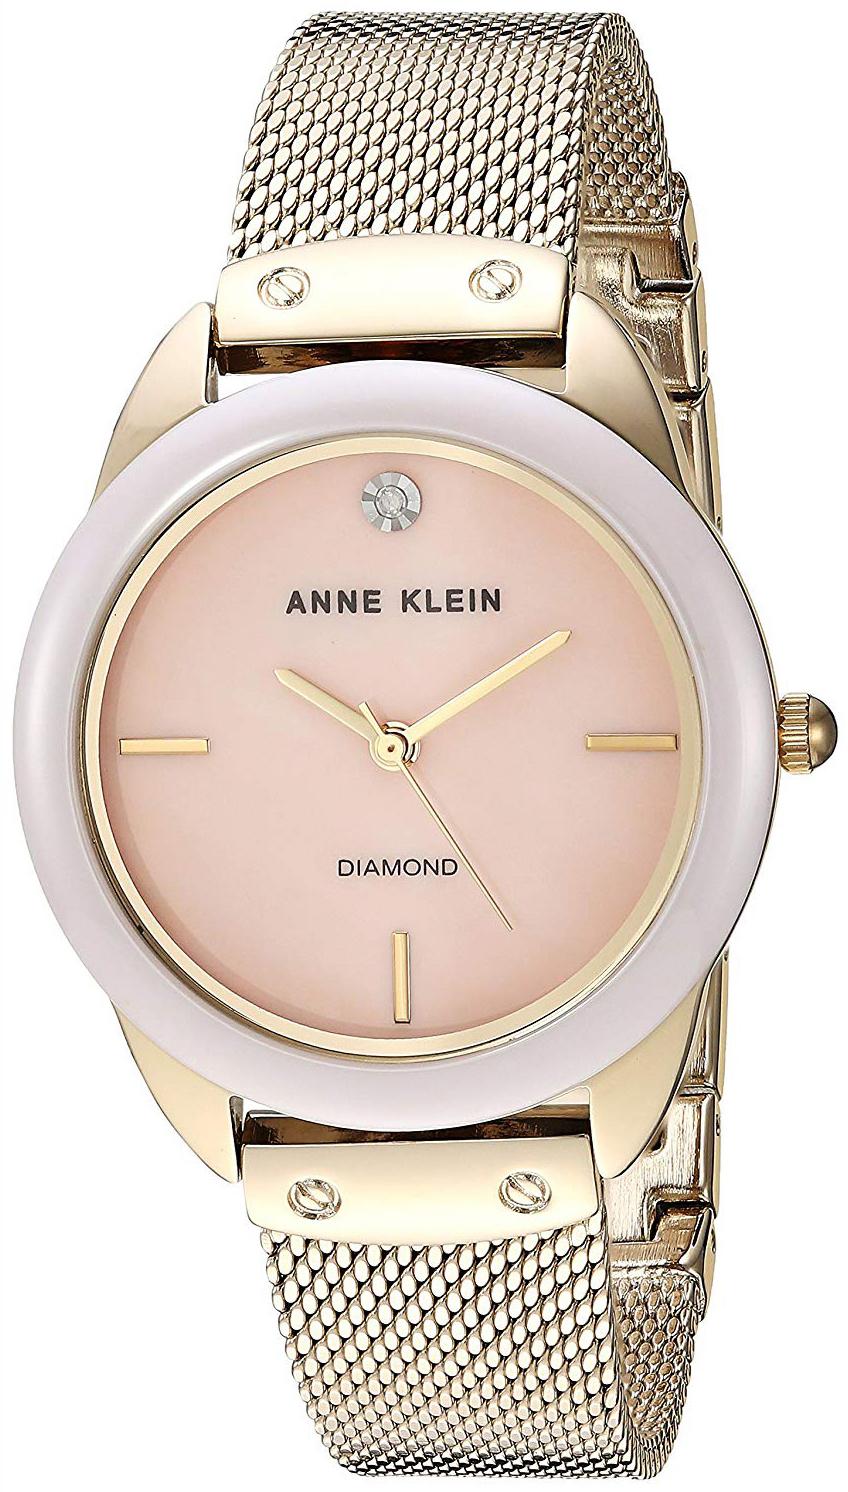 Anne Klein Diamond Dameklokke AK/3258LPGB Rosa/Gulltonet stål Ø32 mm - Anne Klein